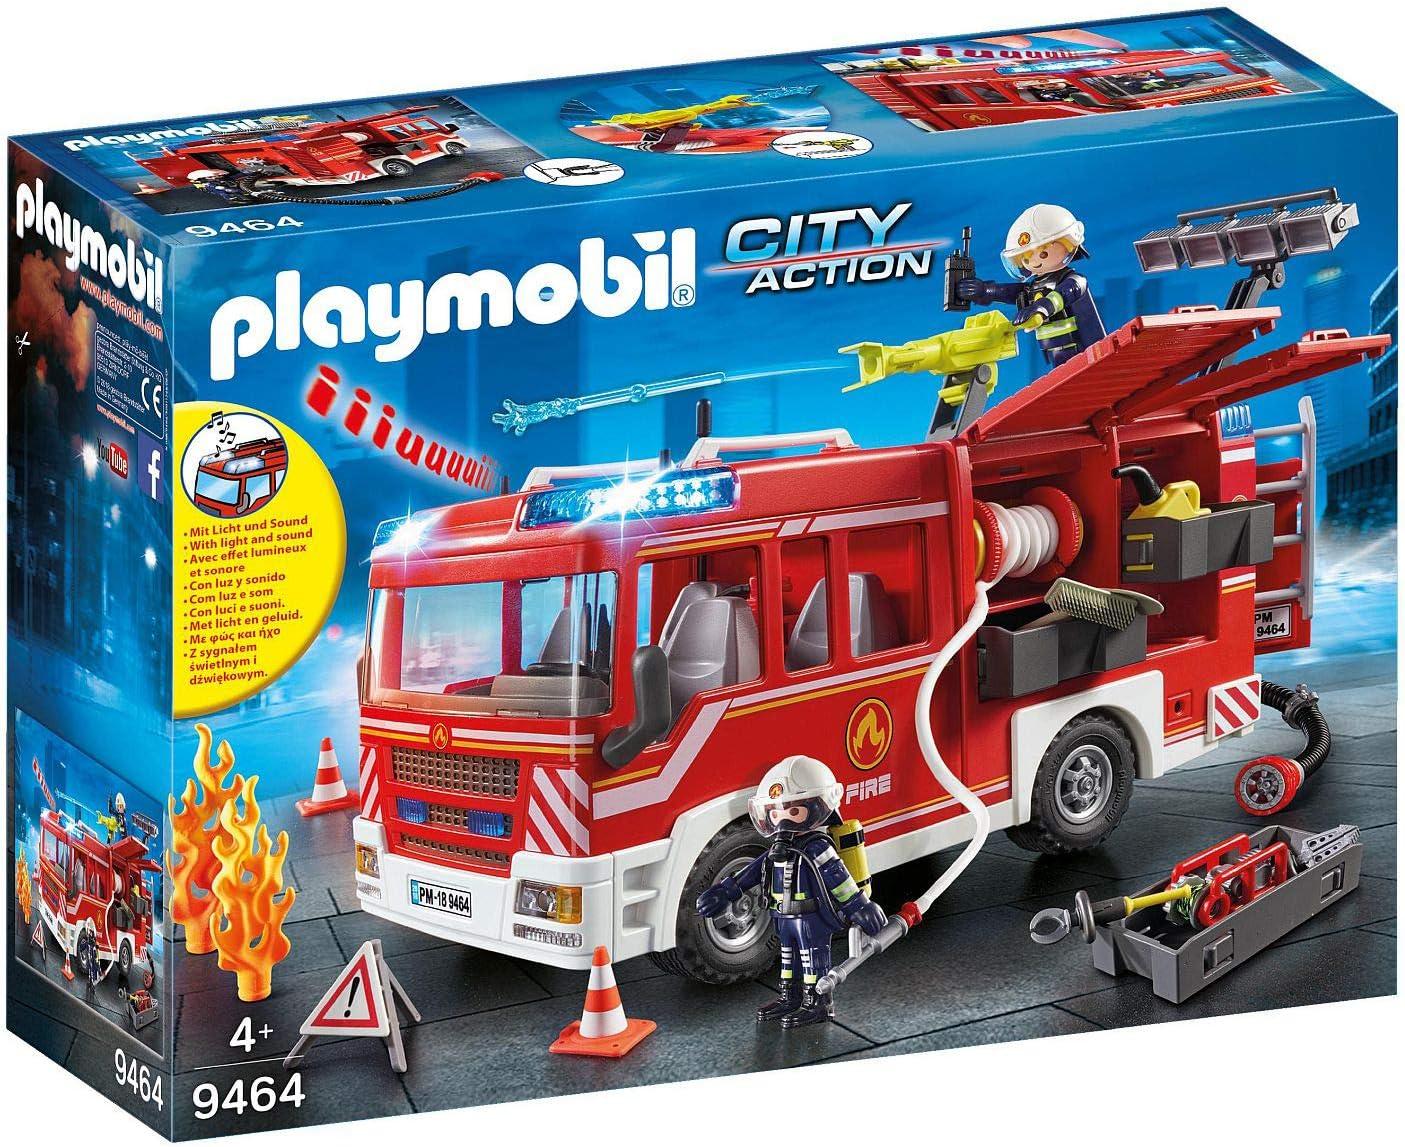 Accesorios Herramientas motor Playmobil